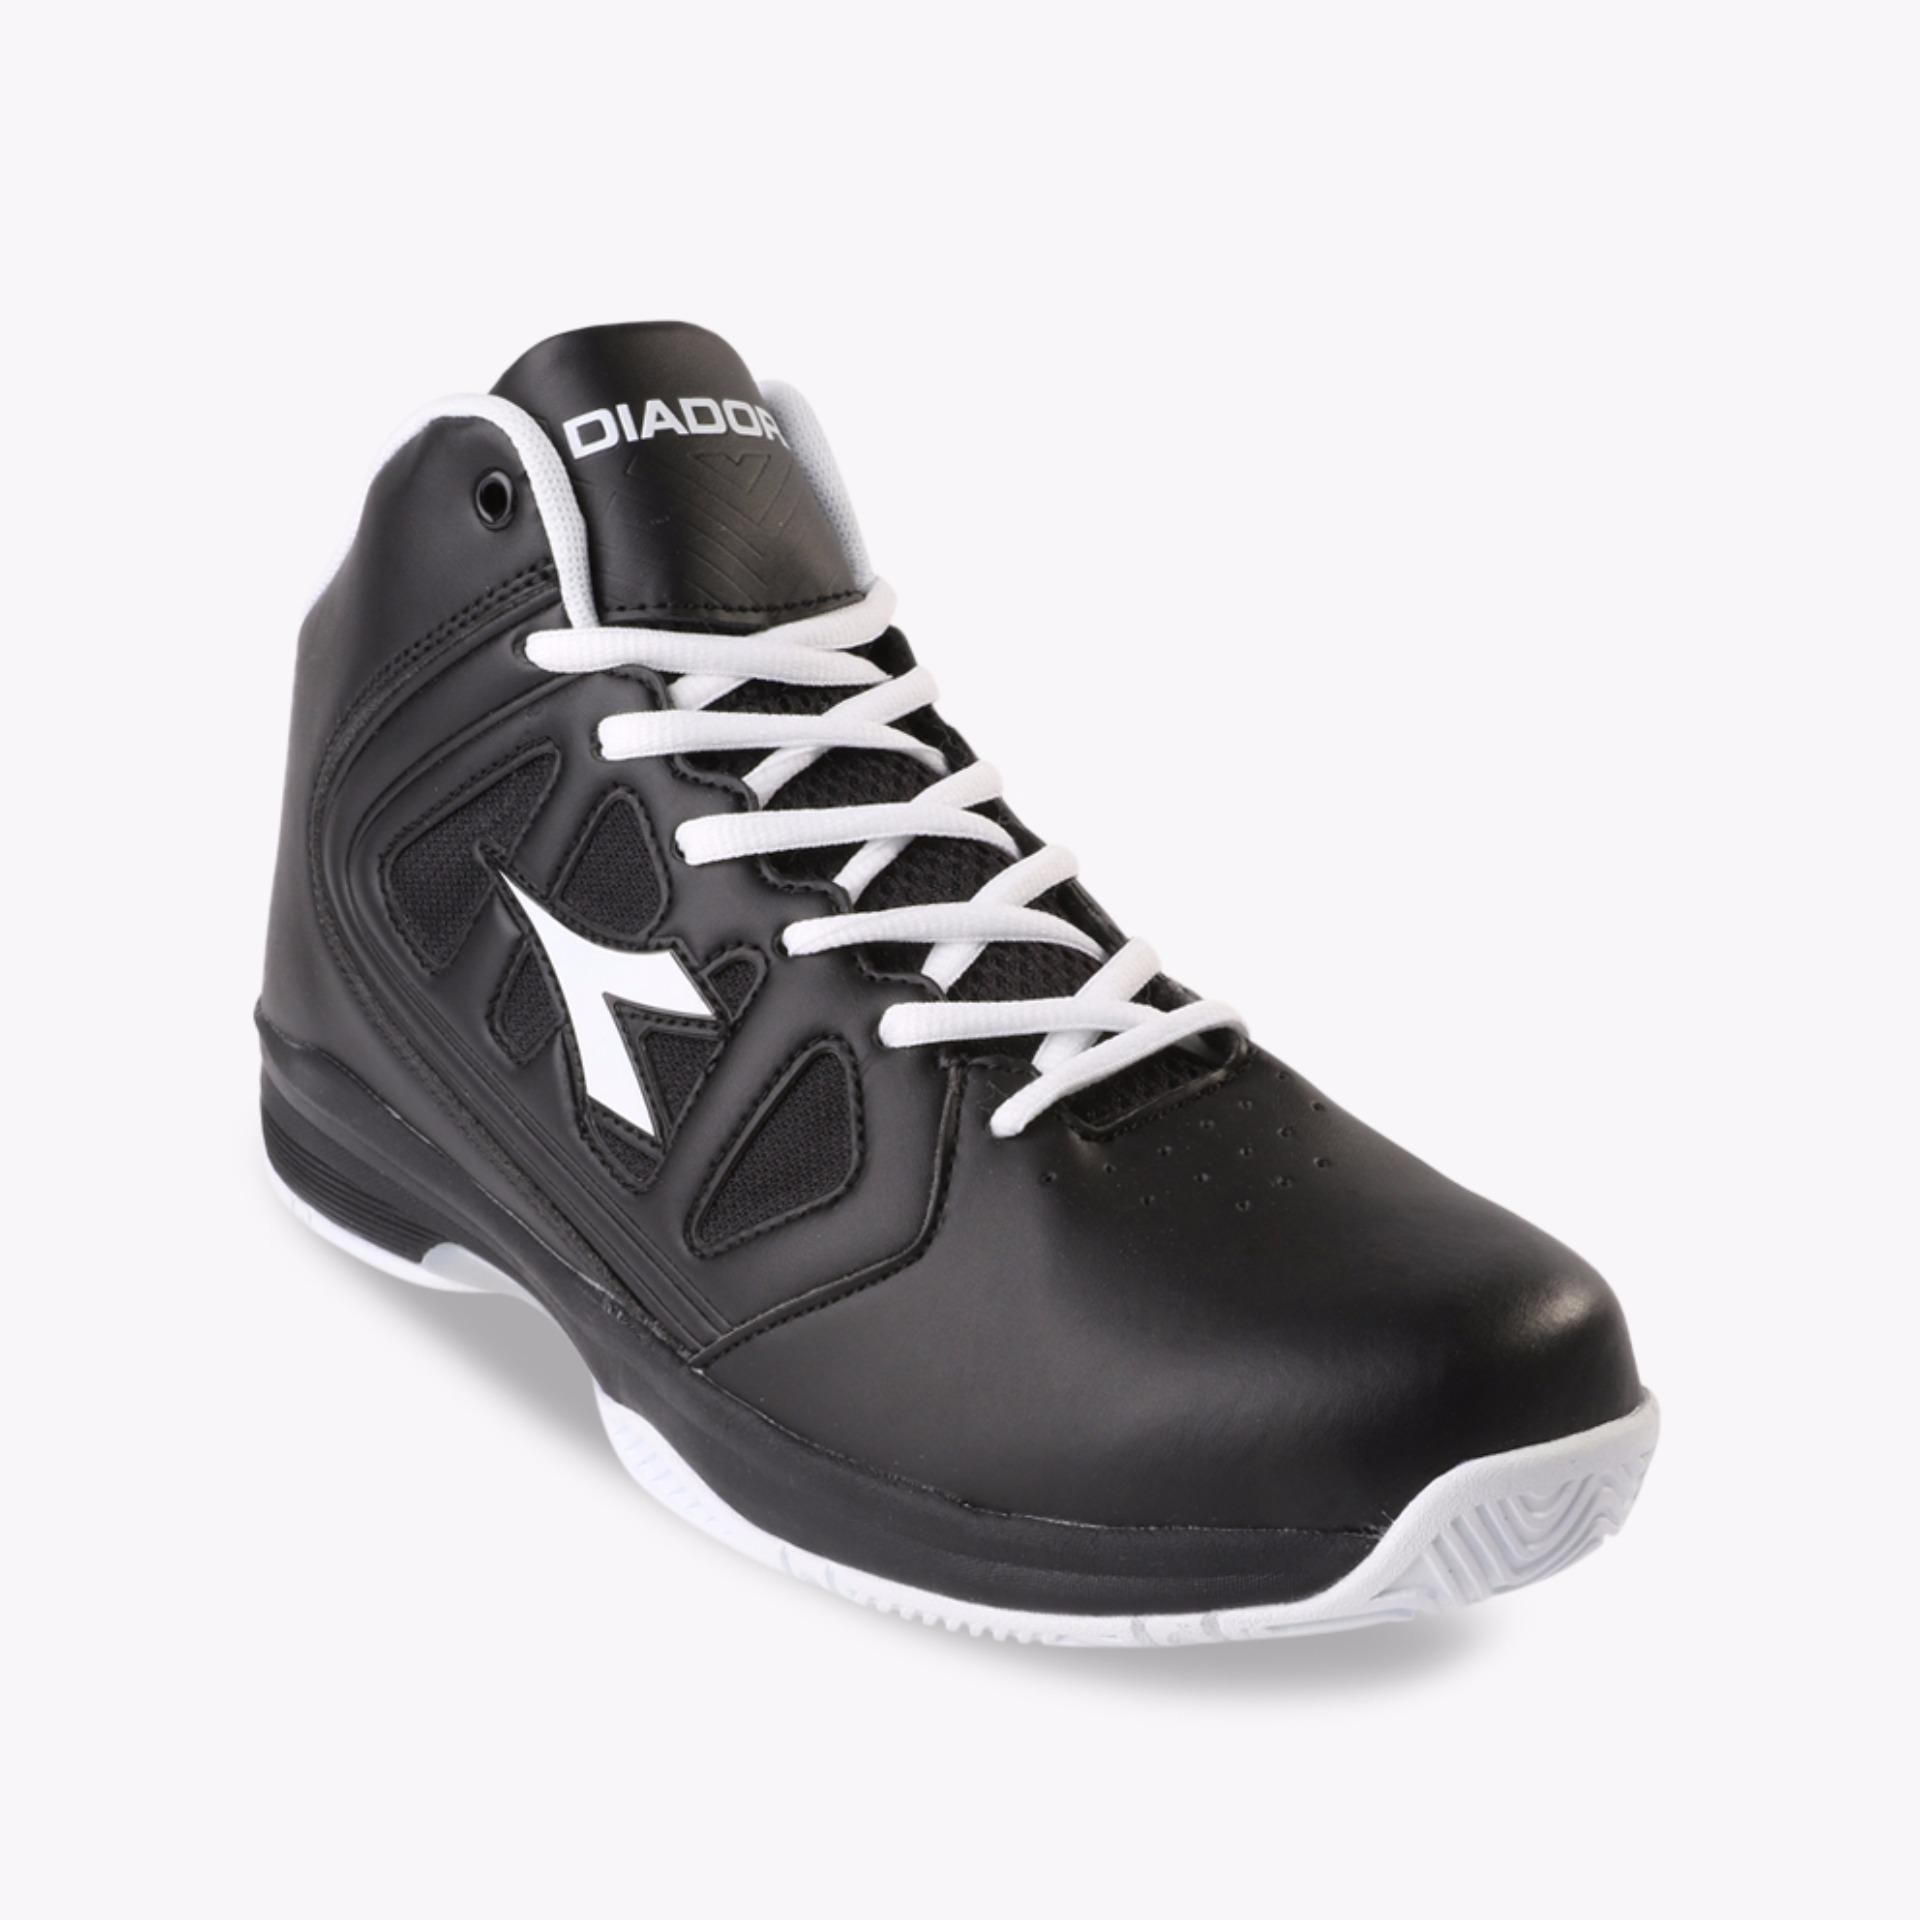 Adidas Neo Cloudfoam Lite Racer Slip On Aw4083 Sneakers Shoes Hitam Biru Sepatu Running Army V2 Original Indonesia M1jxfm Source Diadora